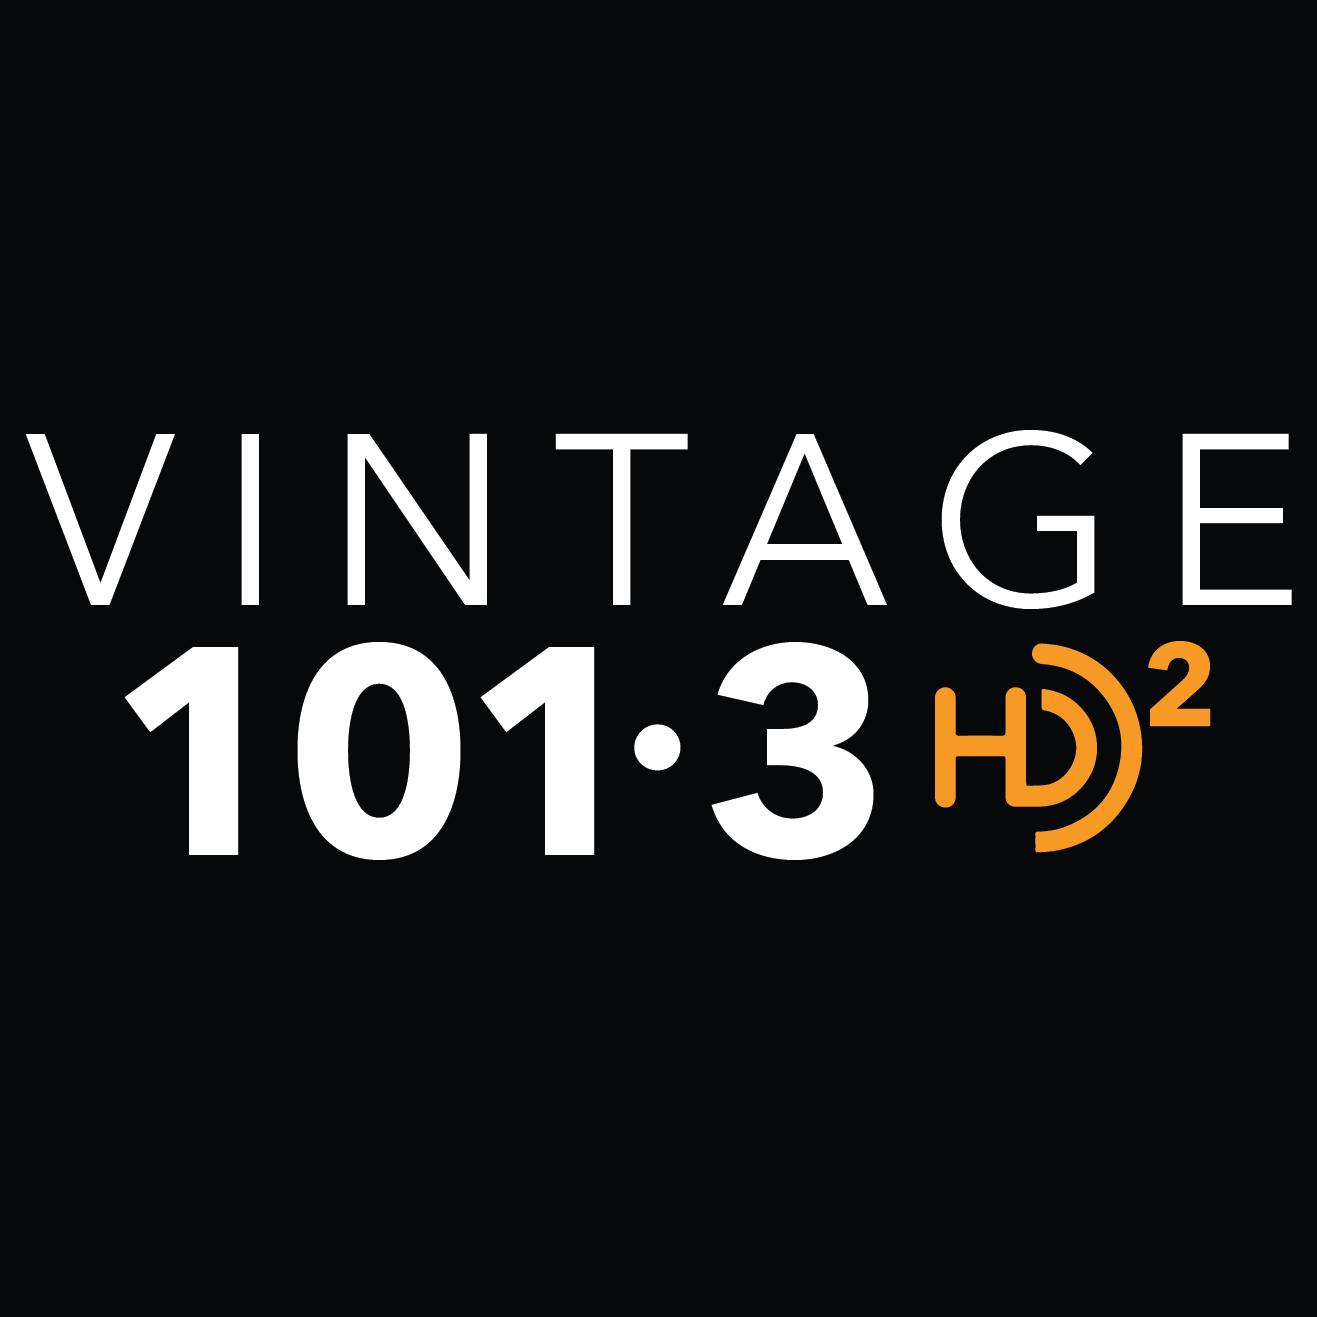 Vintage 101.3FM HD2